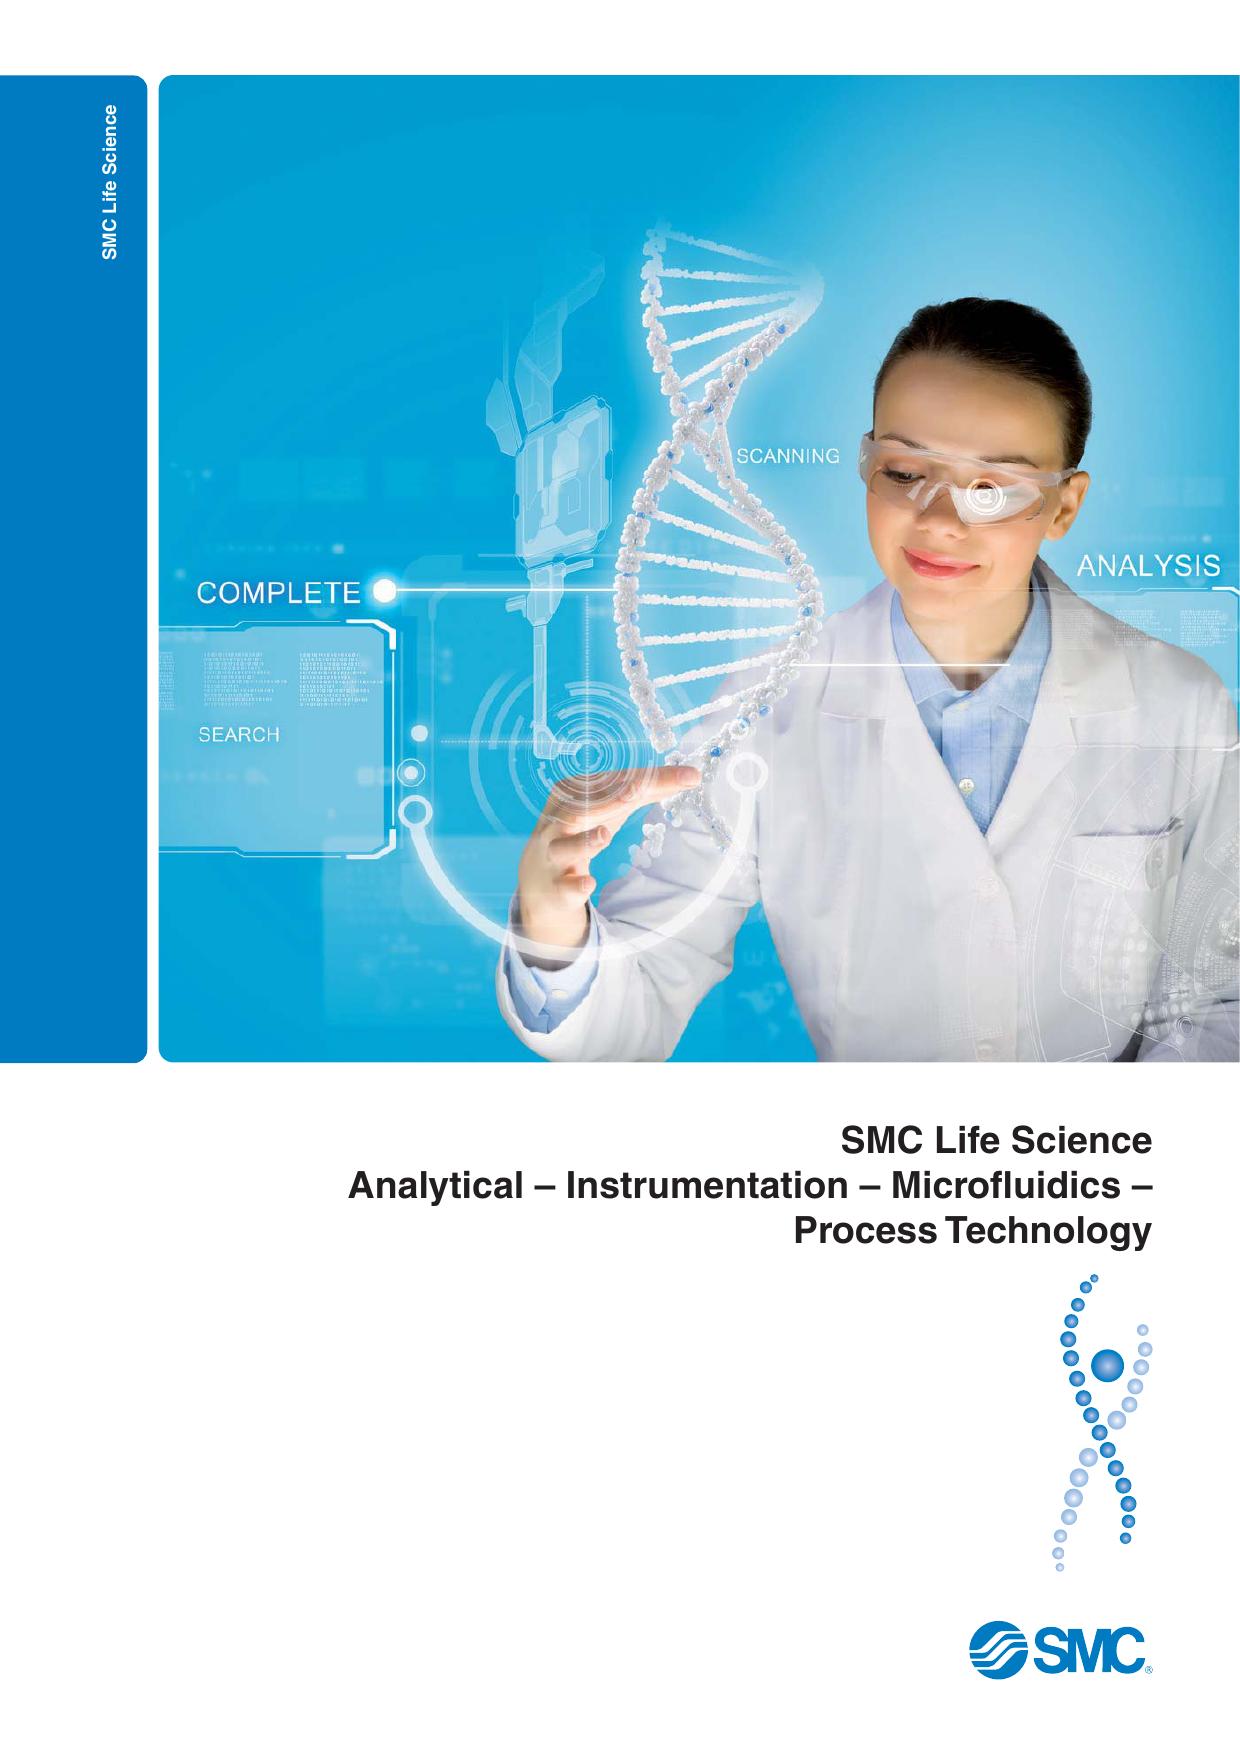 SMC Life Science Analytical – Instrumentation – Microfluidics